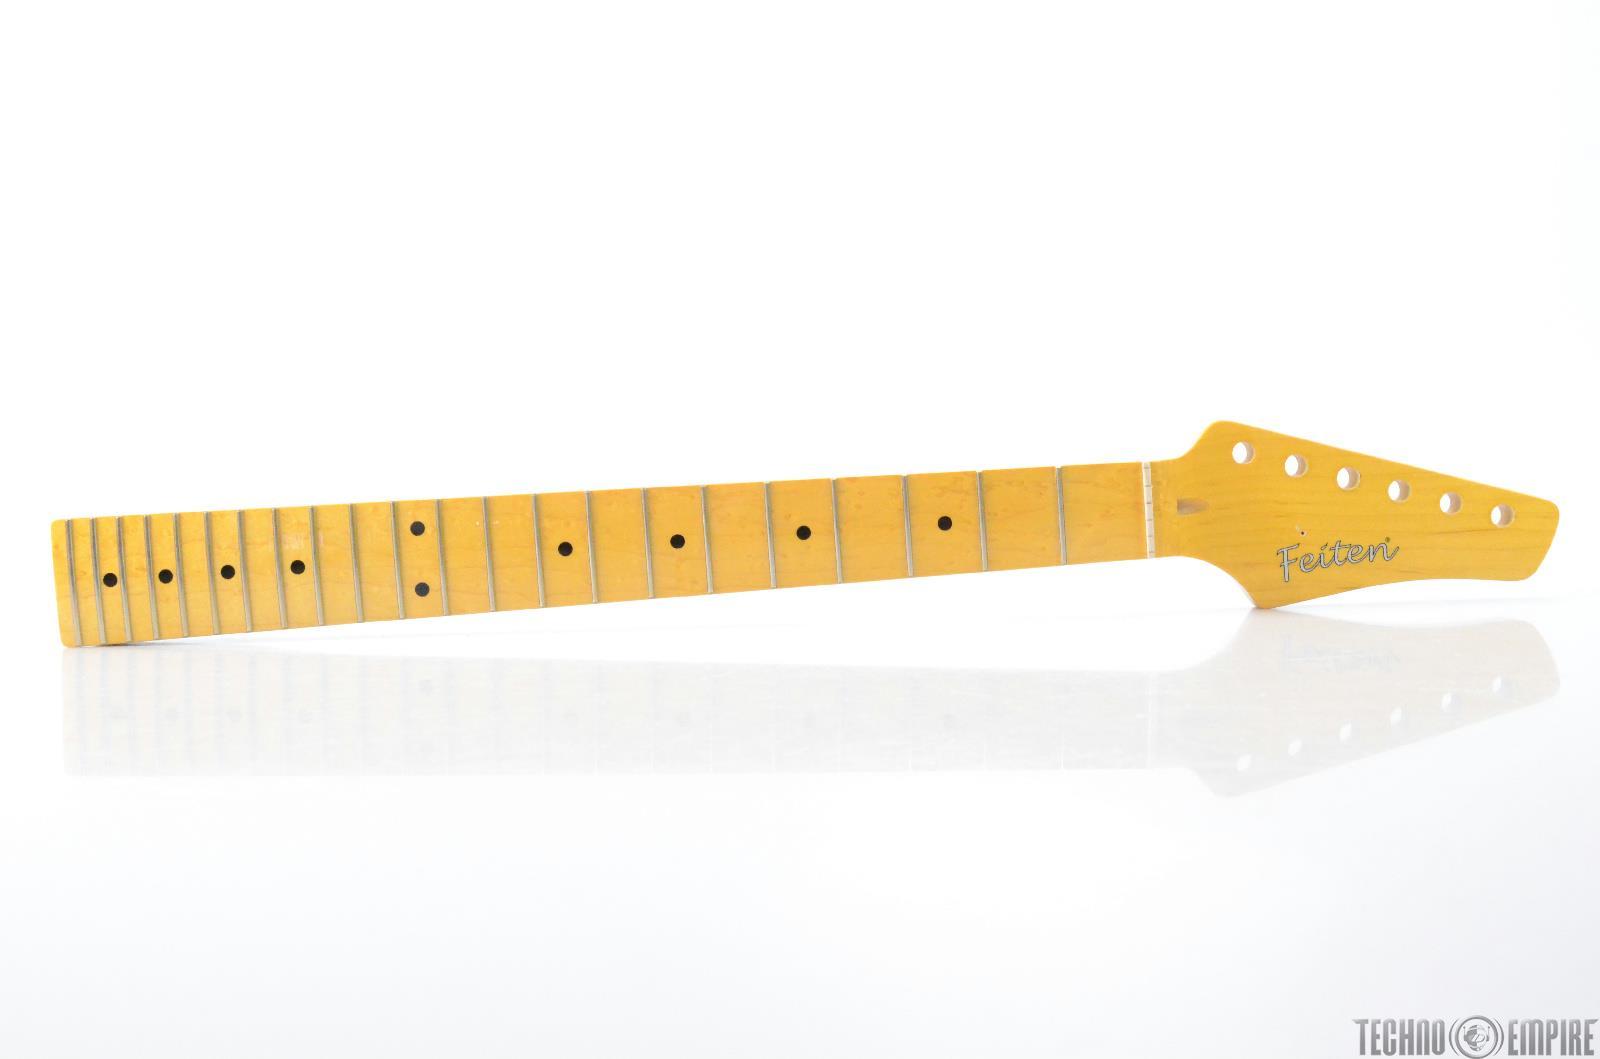 Buzz Feiten Maple Electric Guitar Neck Birdseye Fretboard Nashville Fat #28568